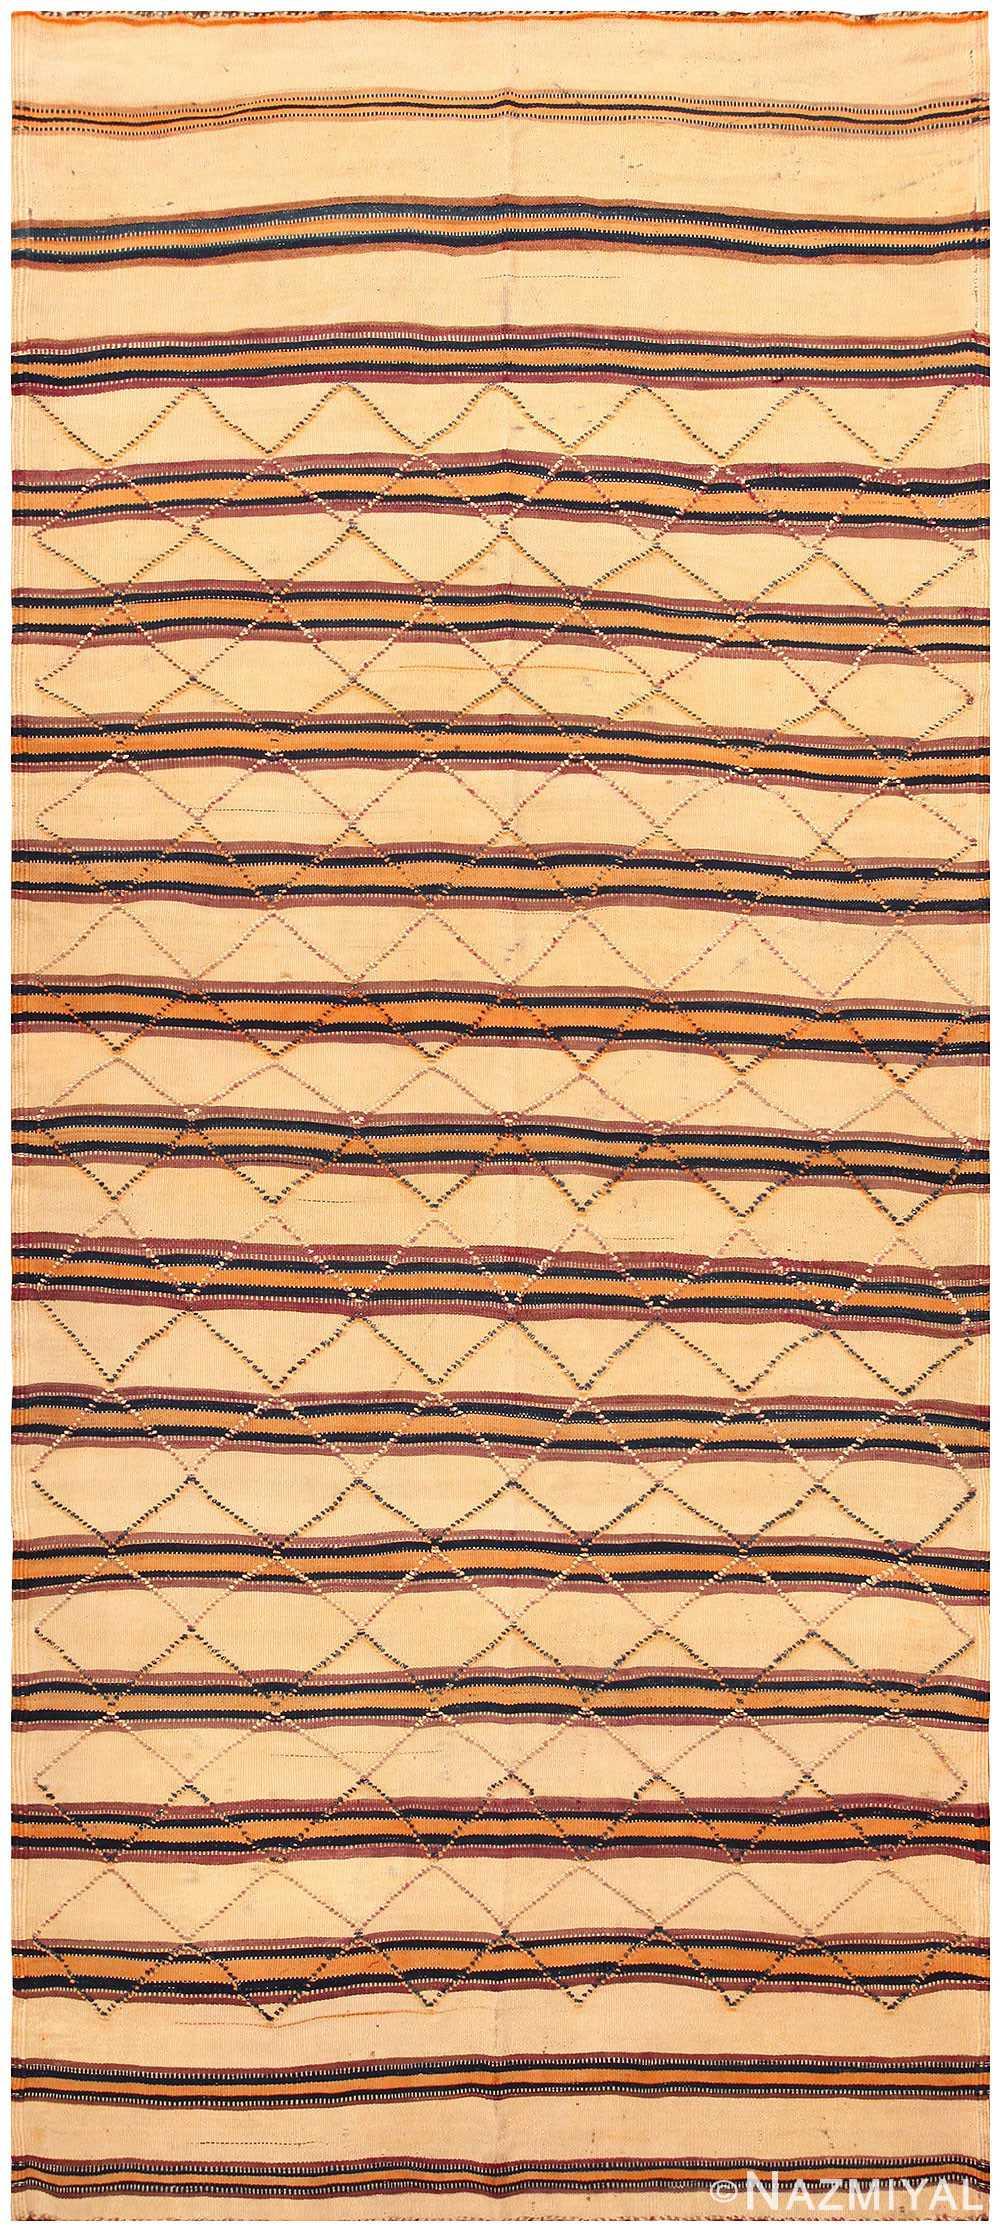 Vintage Moroccan Kilim 46467 Large Image